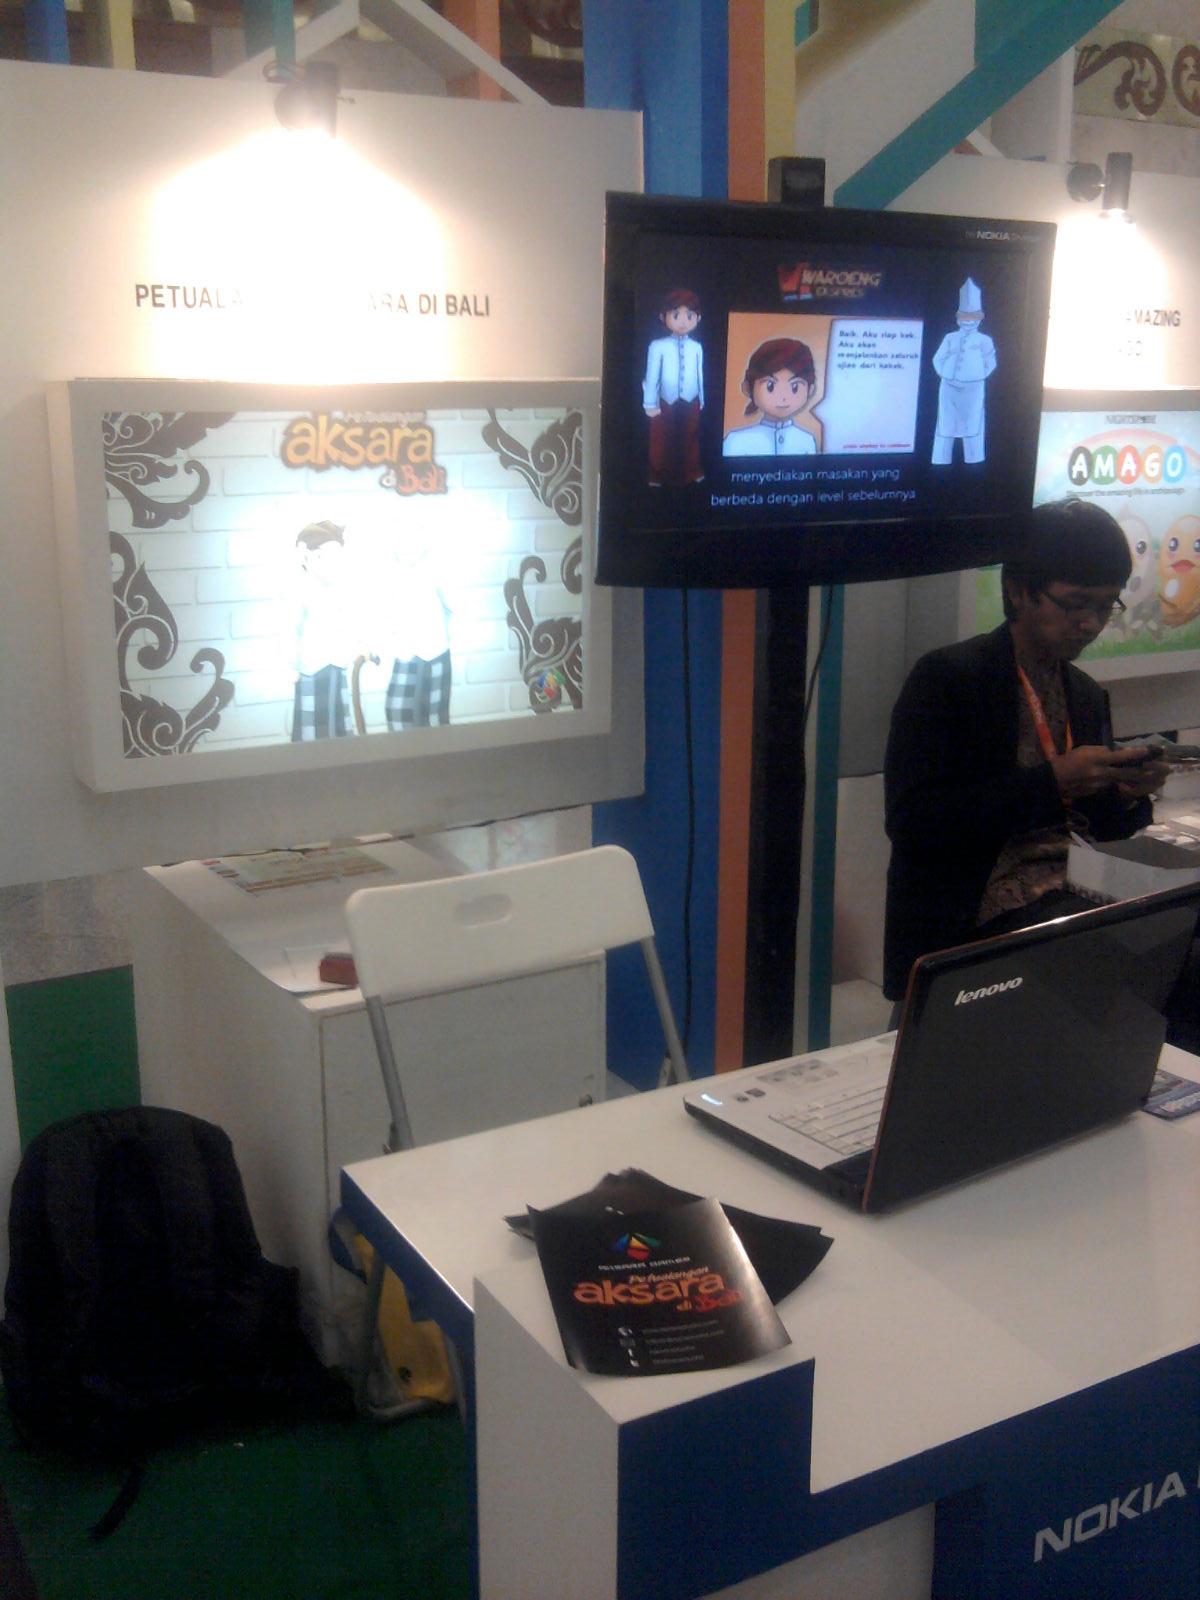 Aksara Studio Booth @INAICTA 2011